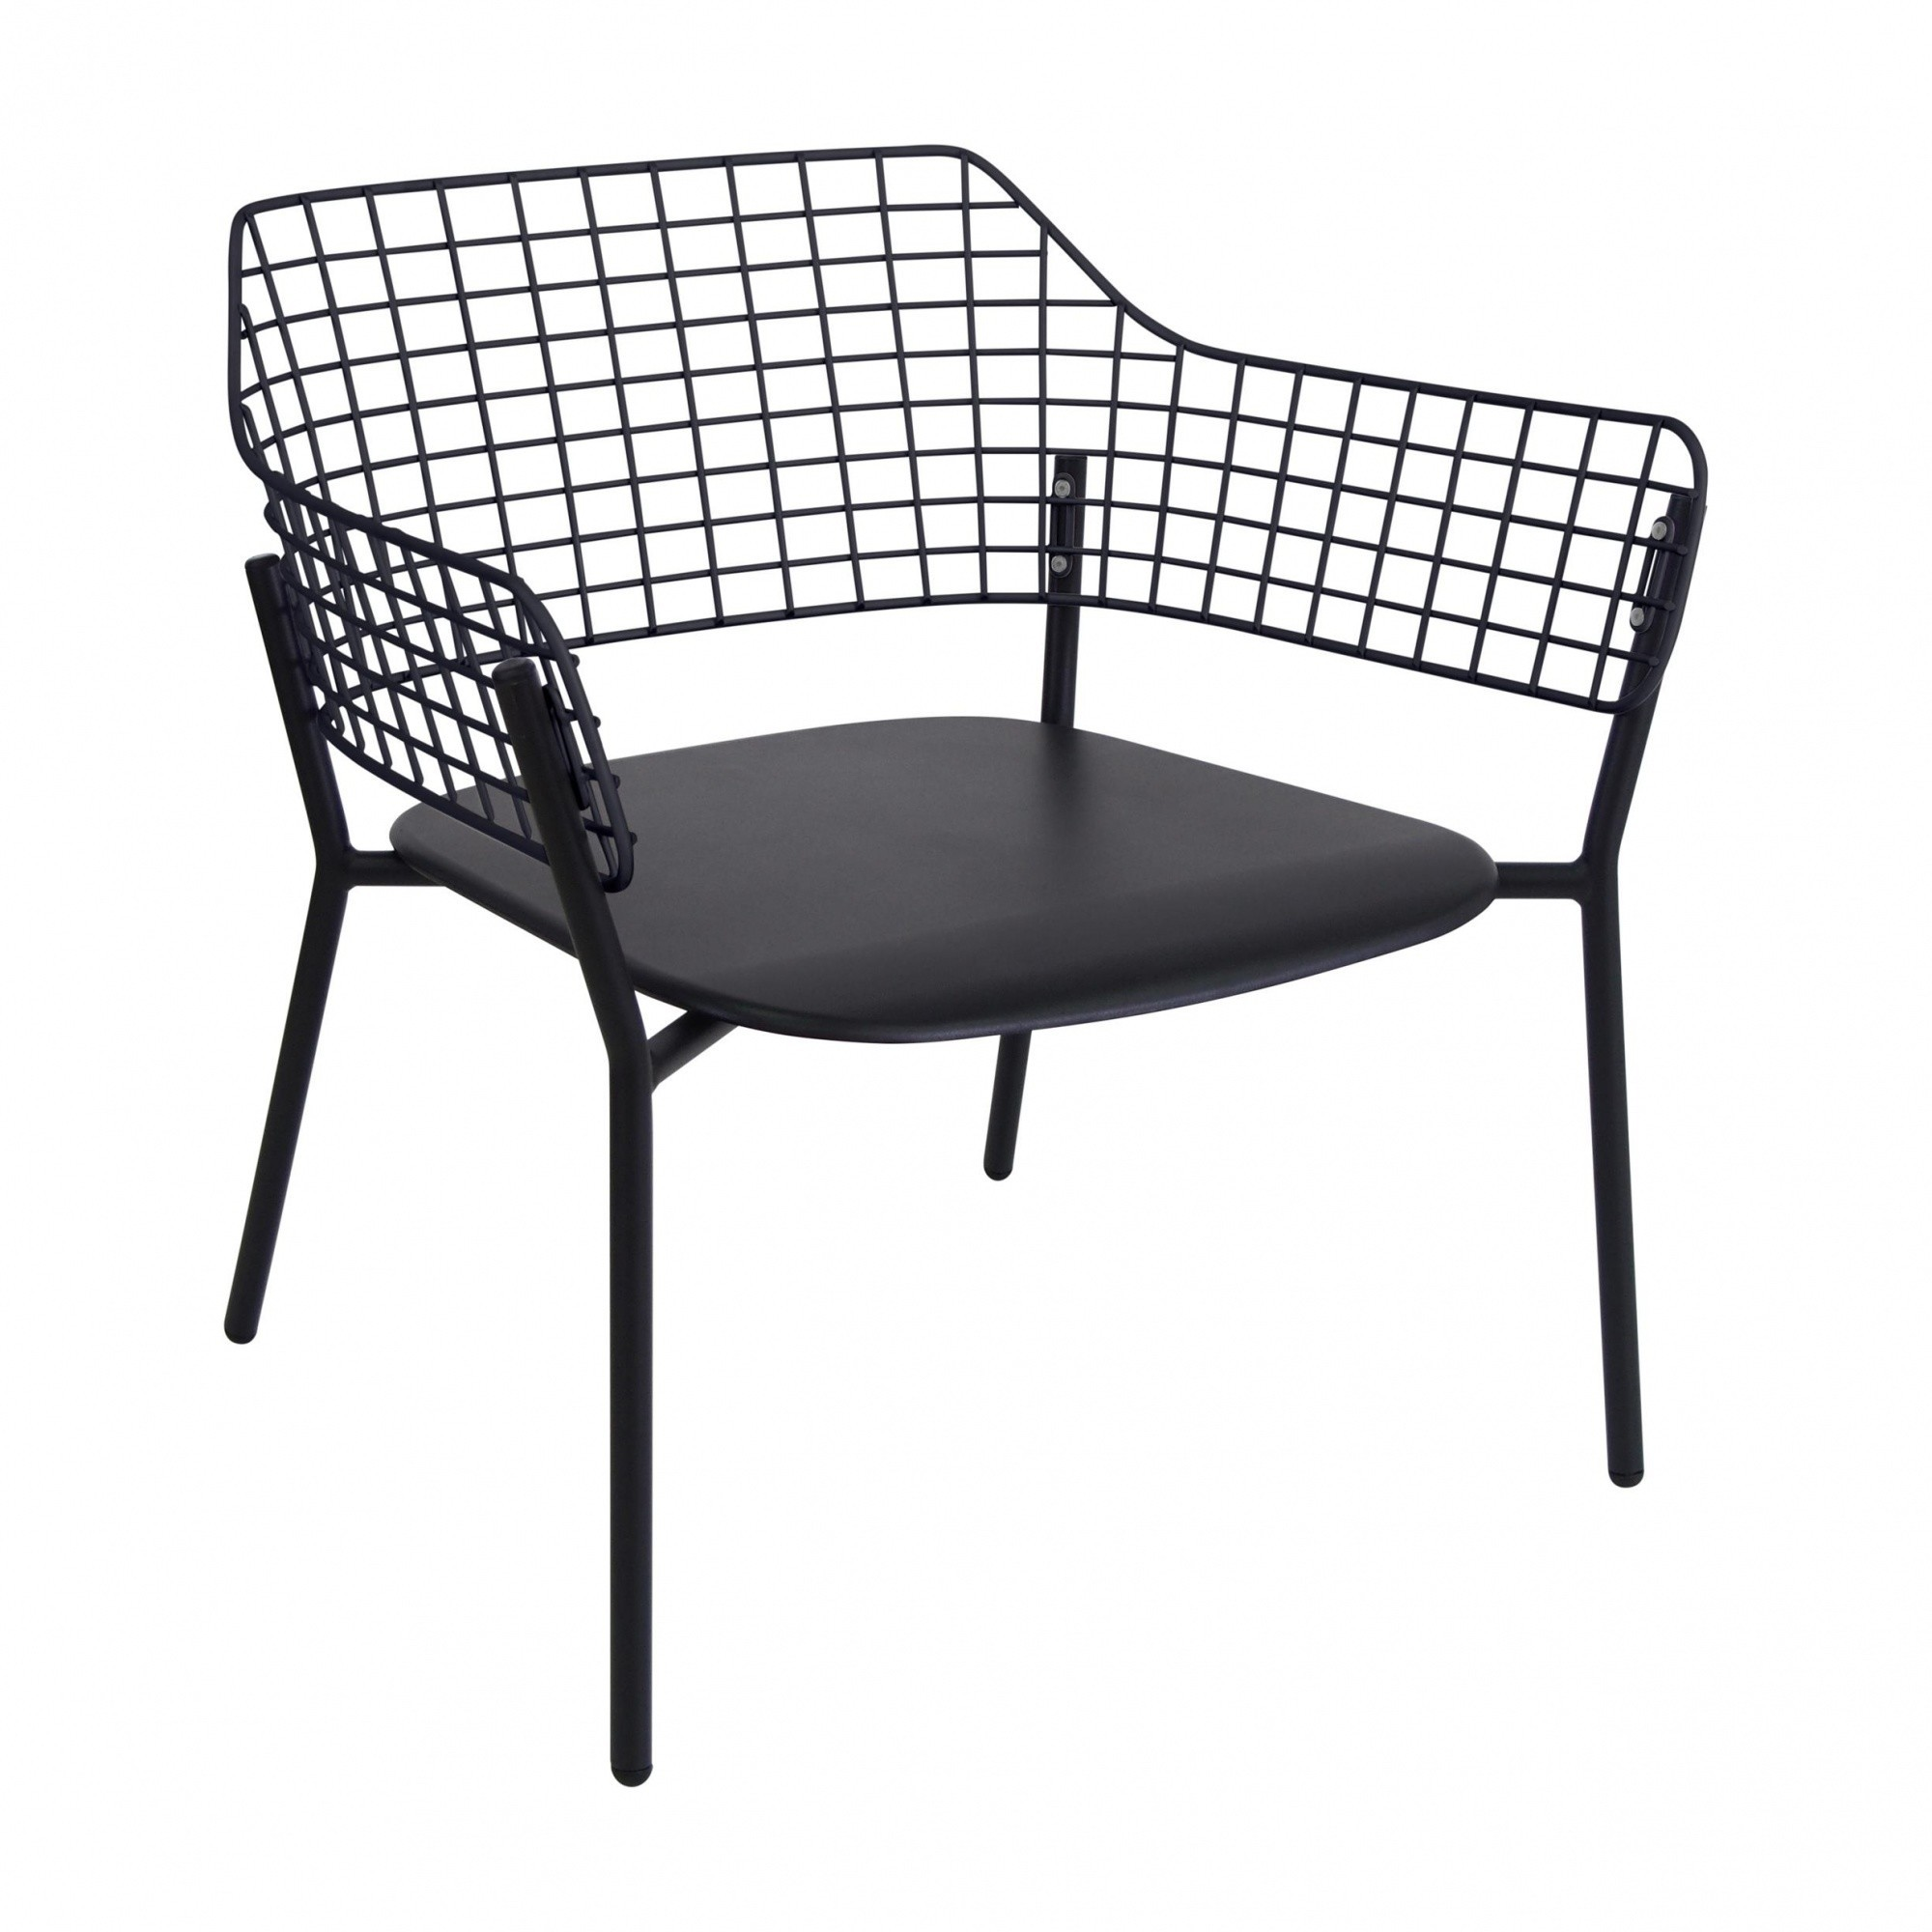 Lyze Garden Lounge Chair Emu Garten Loungesessel Schwarz Pulverbeschichtet Bxhxt 76x73x72cm